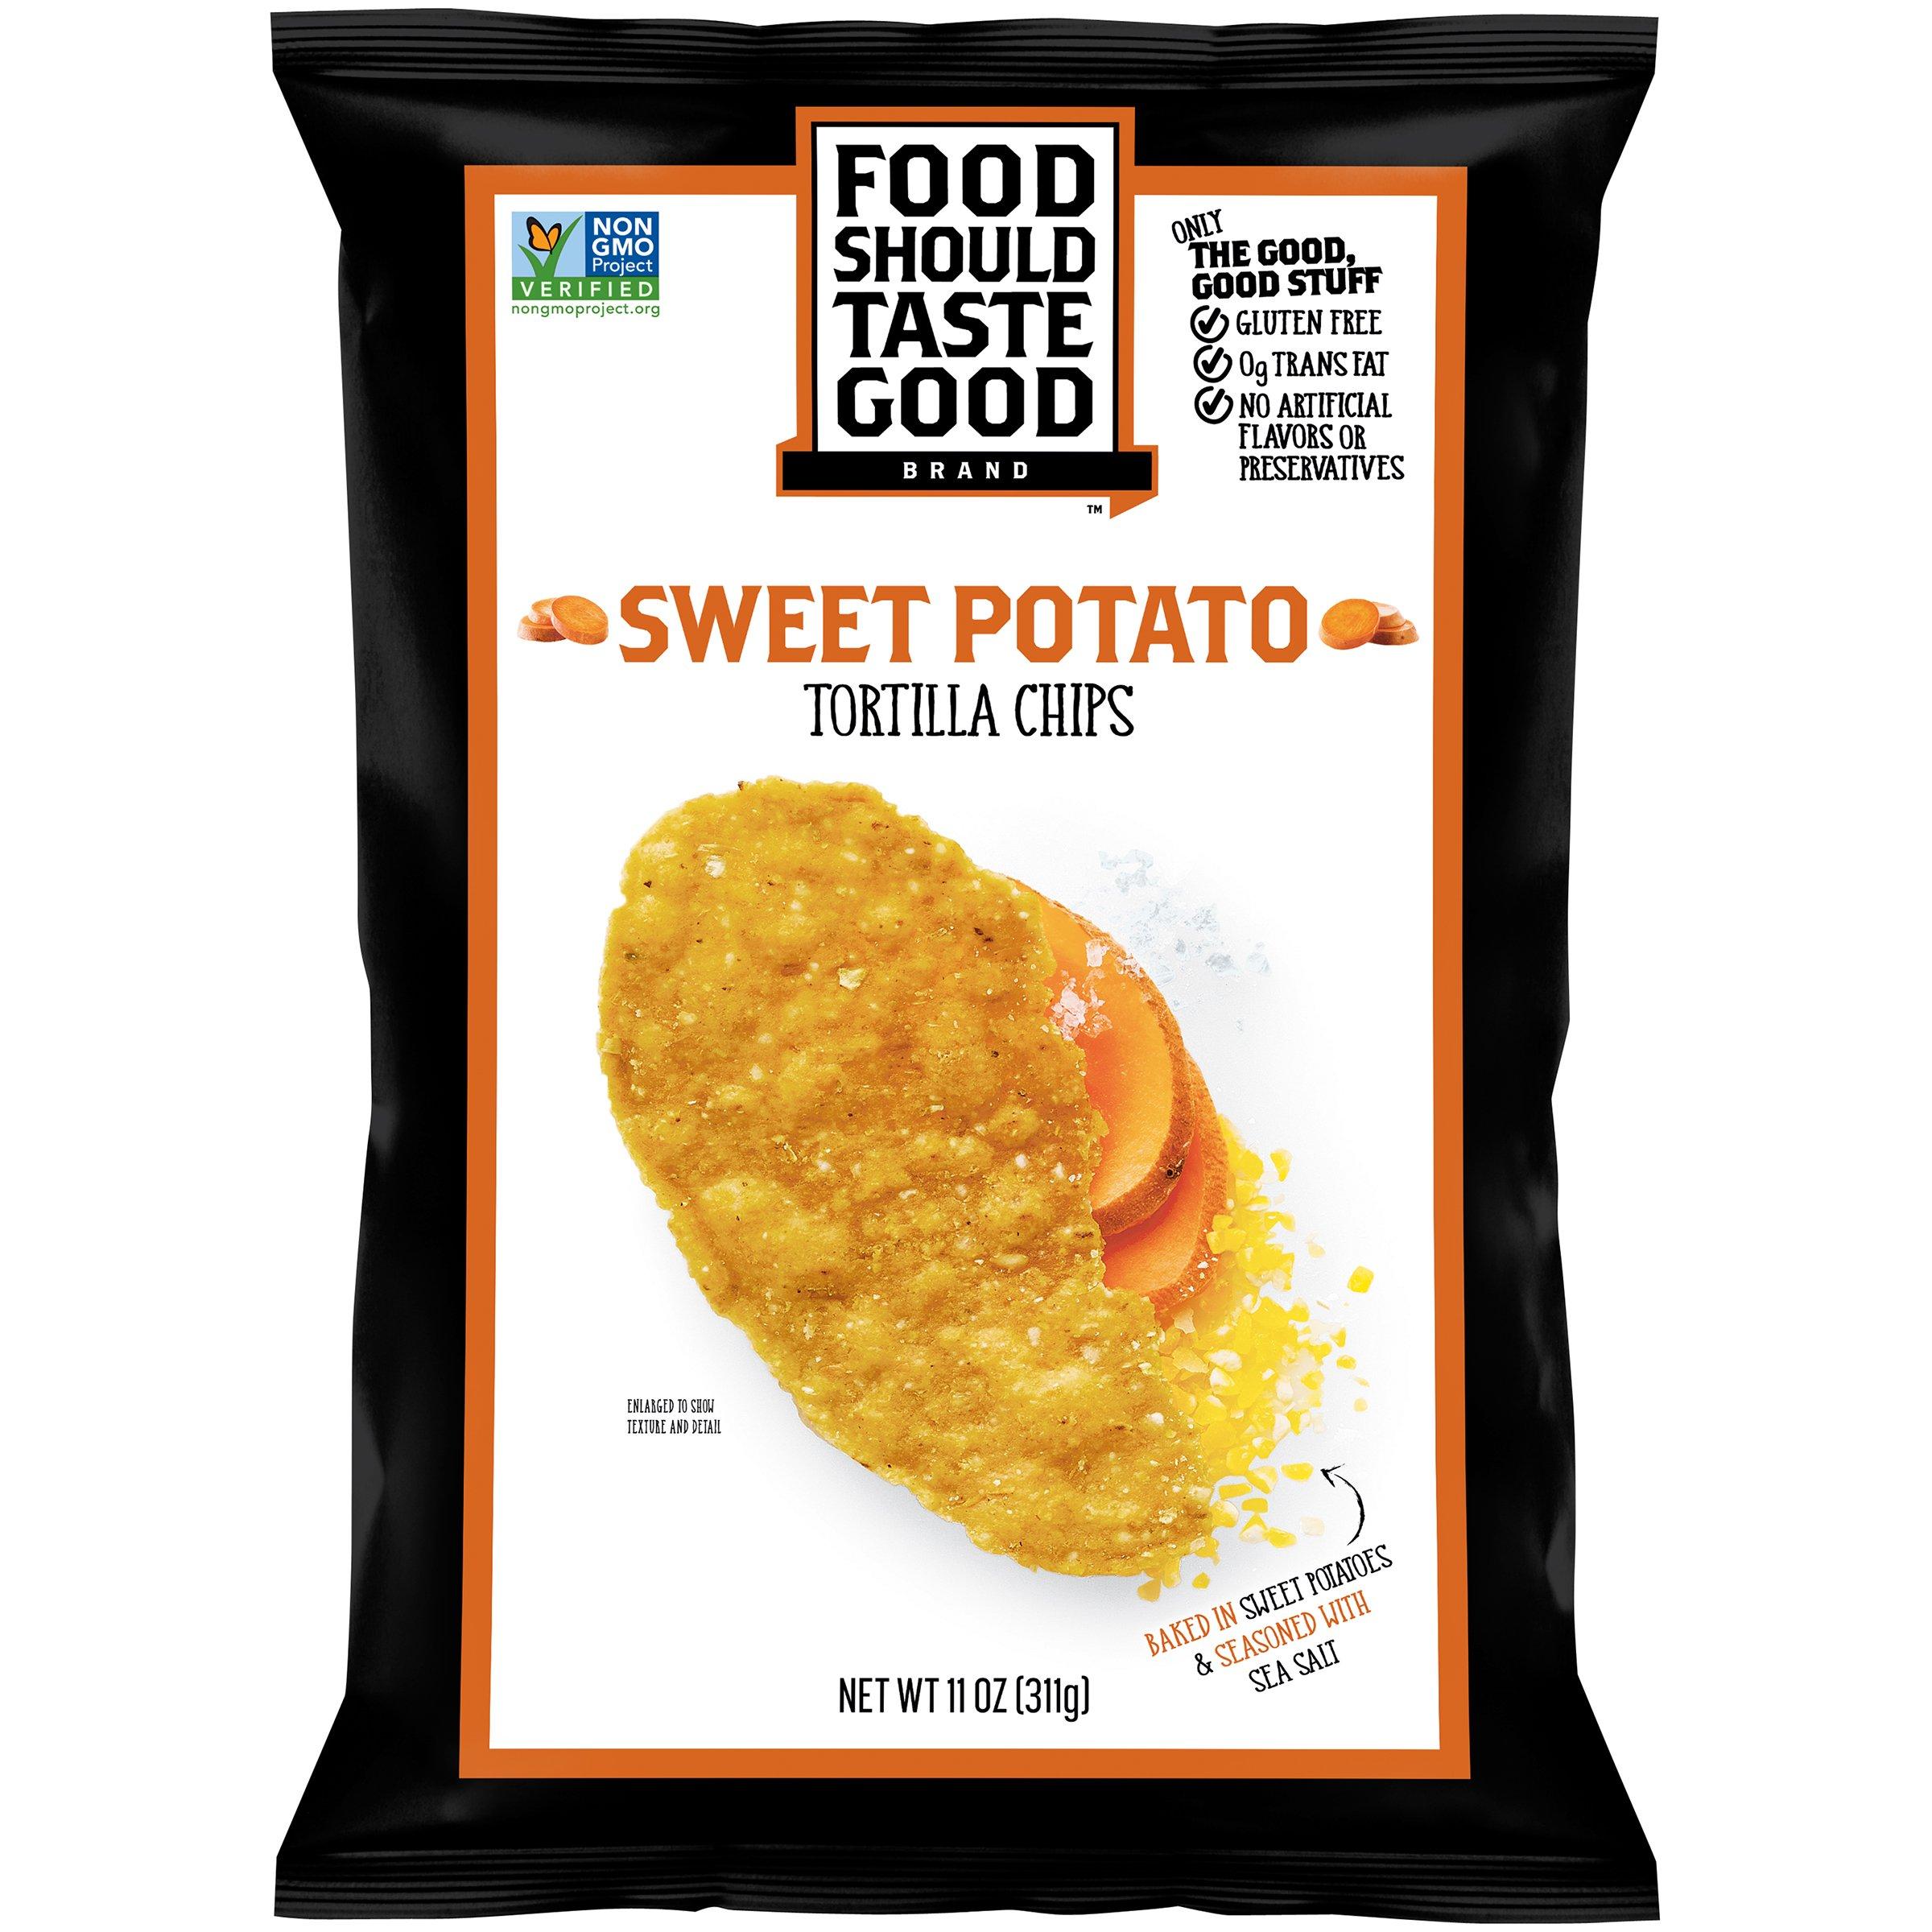 Food Should Taste Good, Tortilla Chips, Sweet Potato, Gluten Free Chips, 11 oz